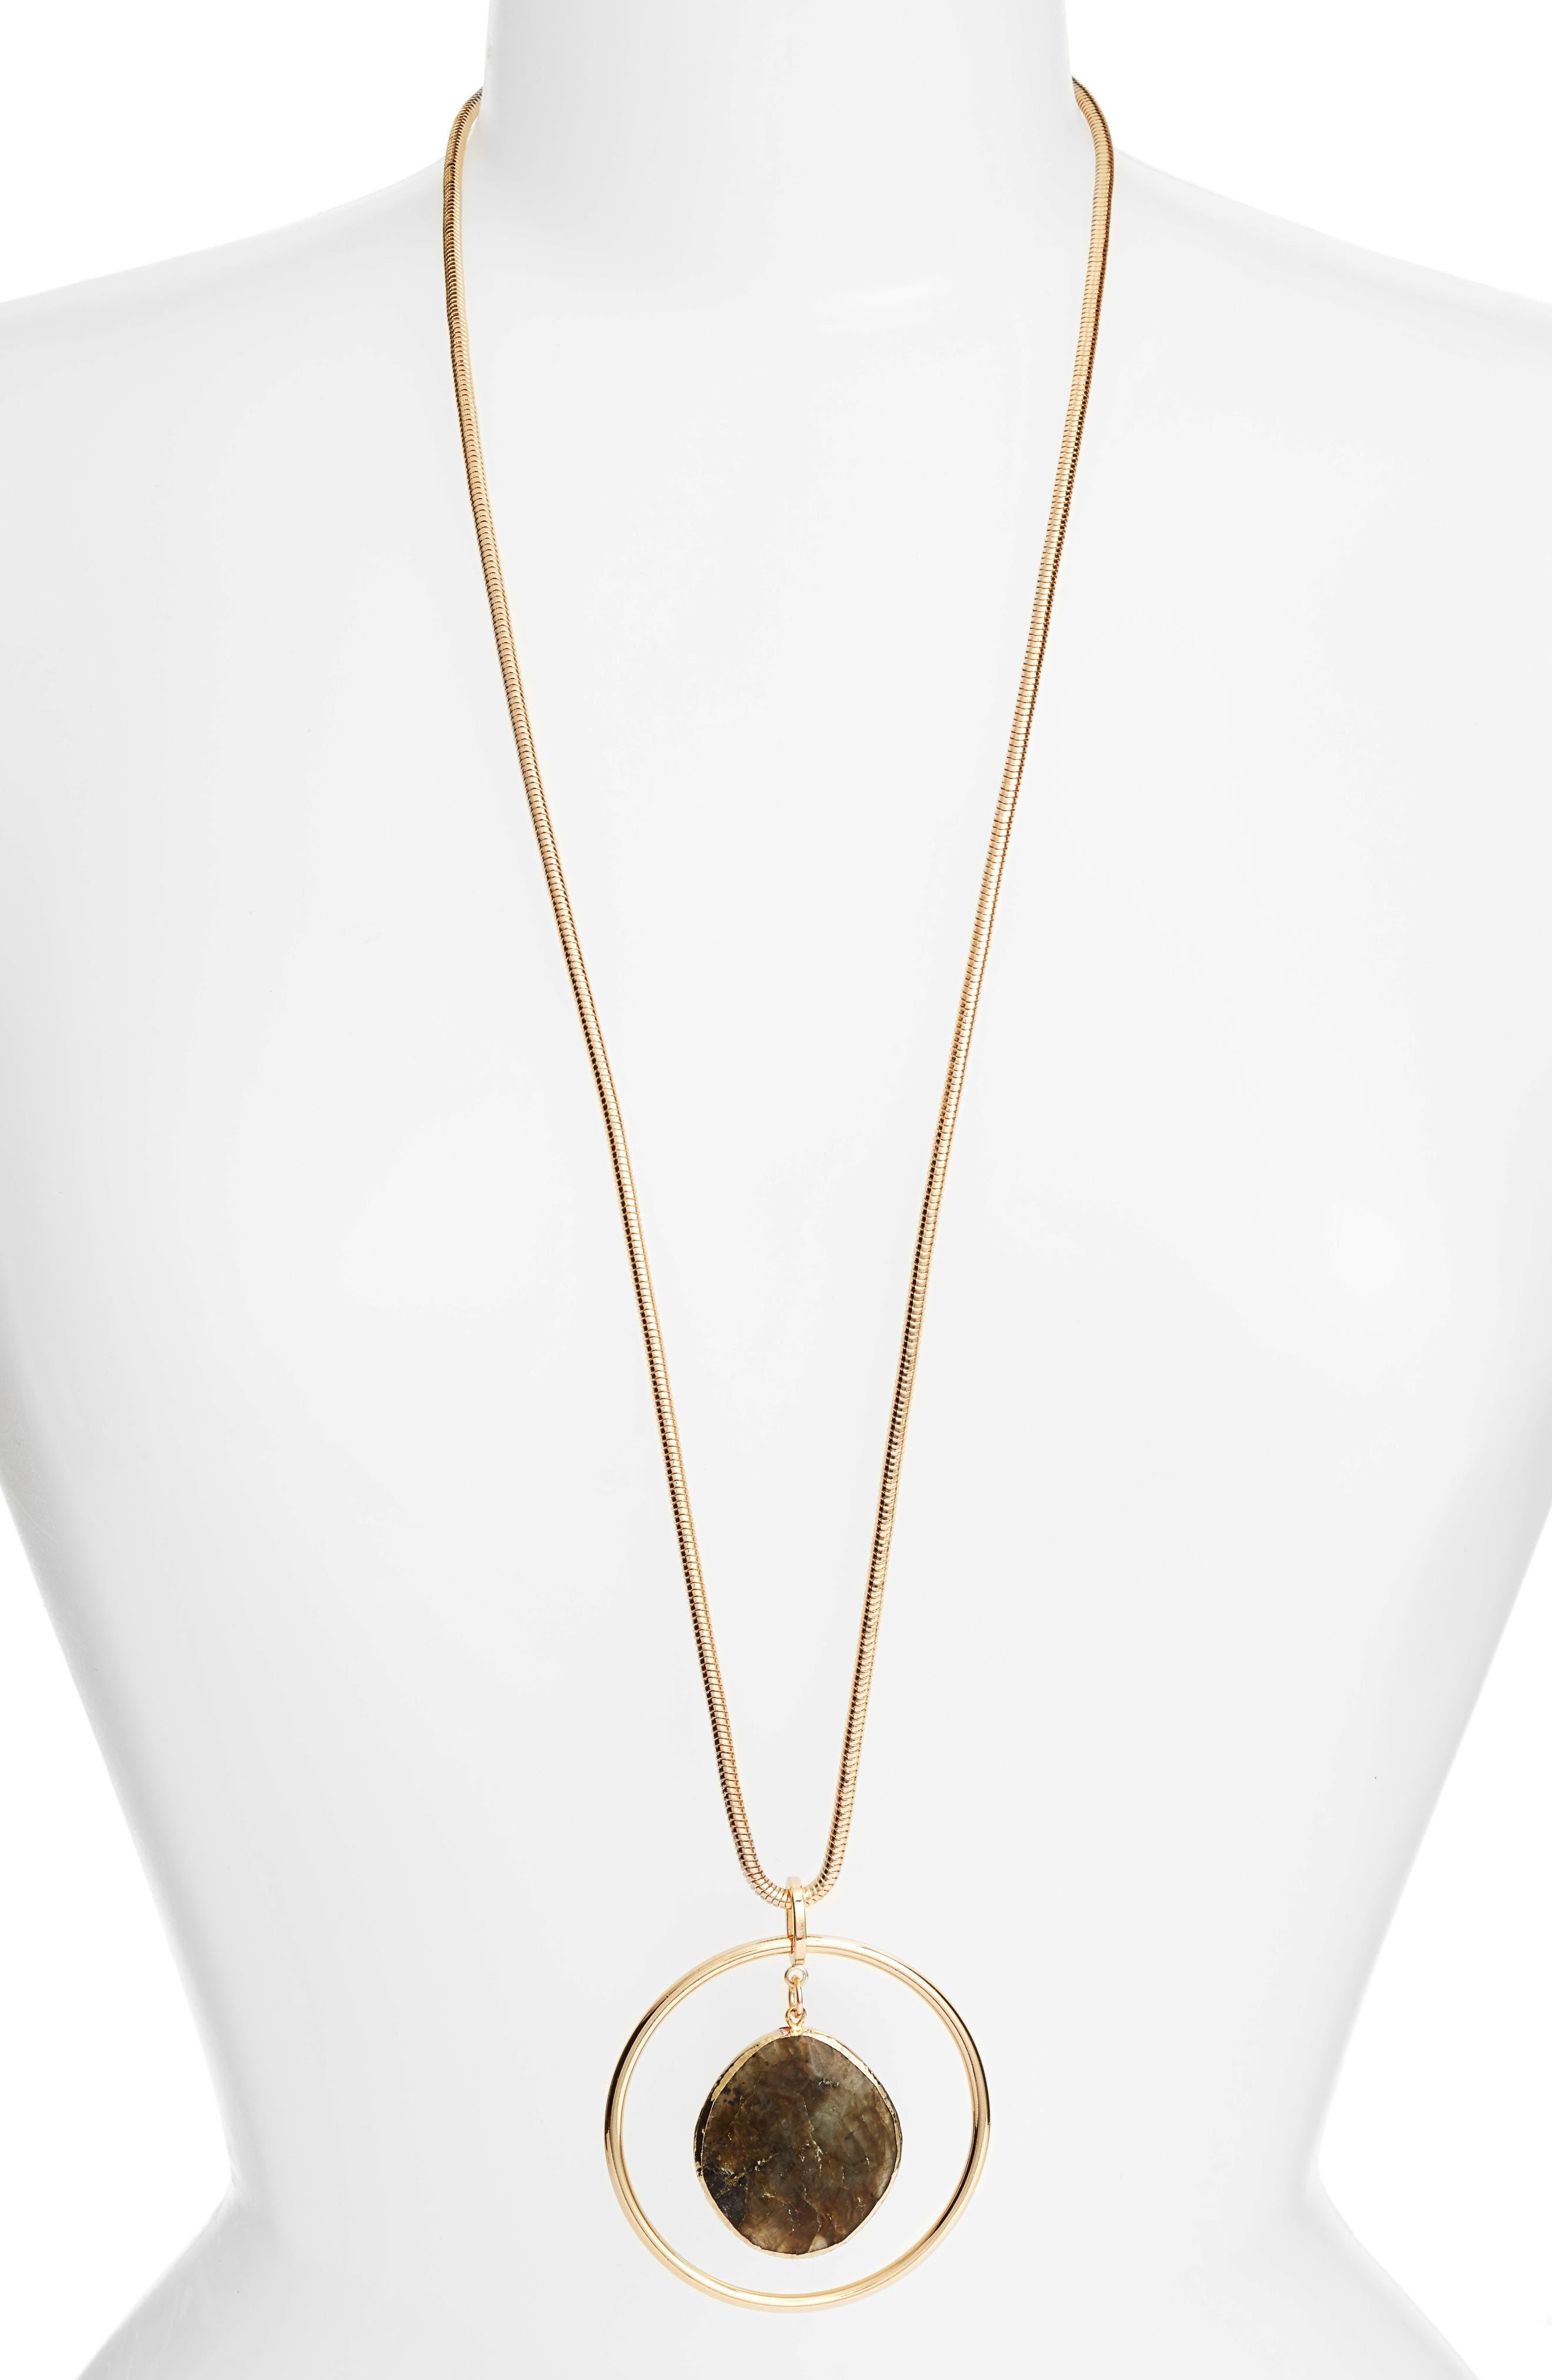 Nordstrom Pendant Necklace